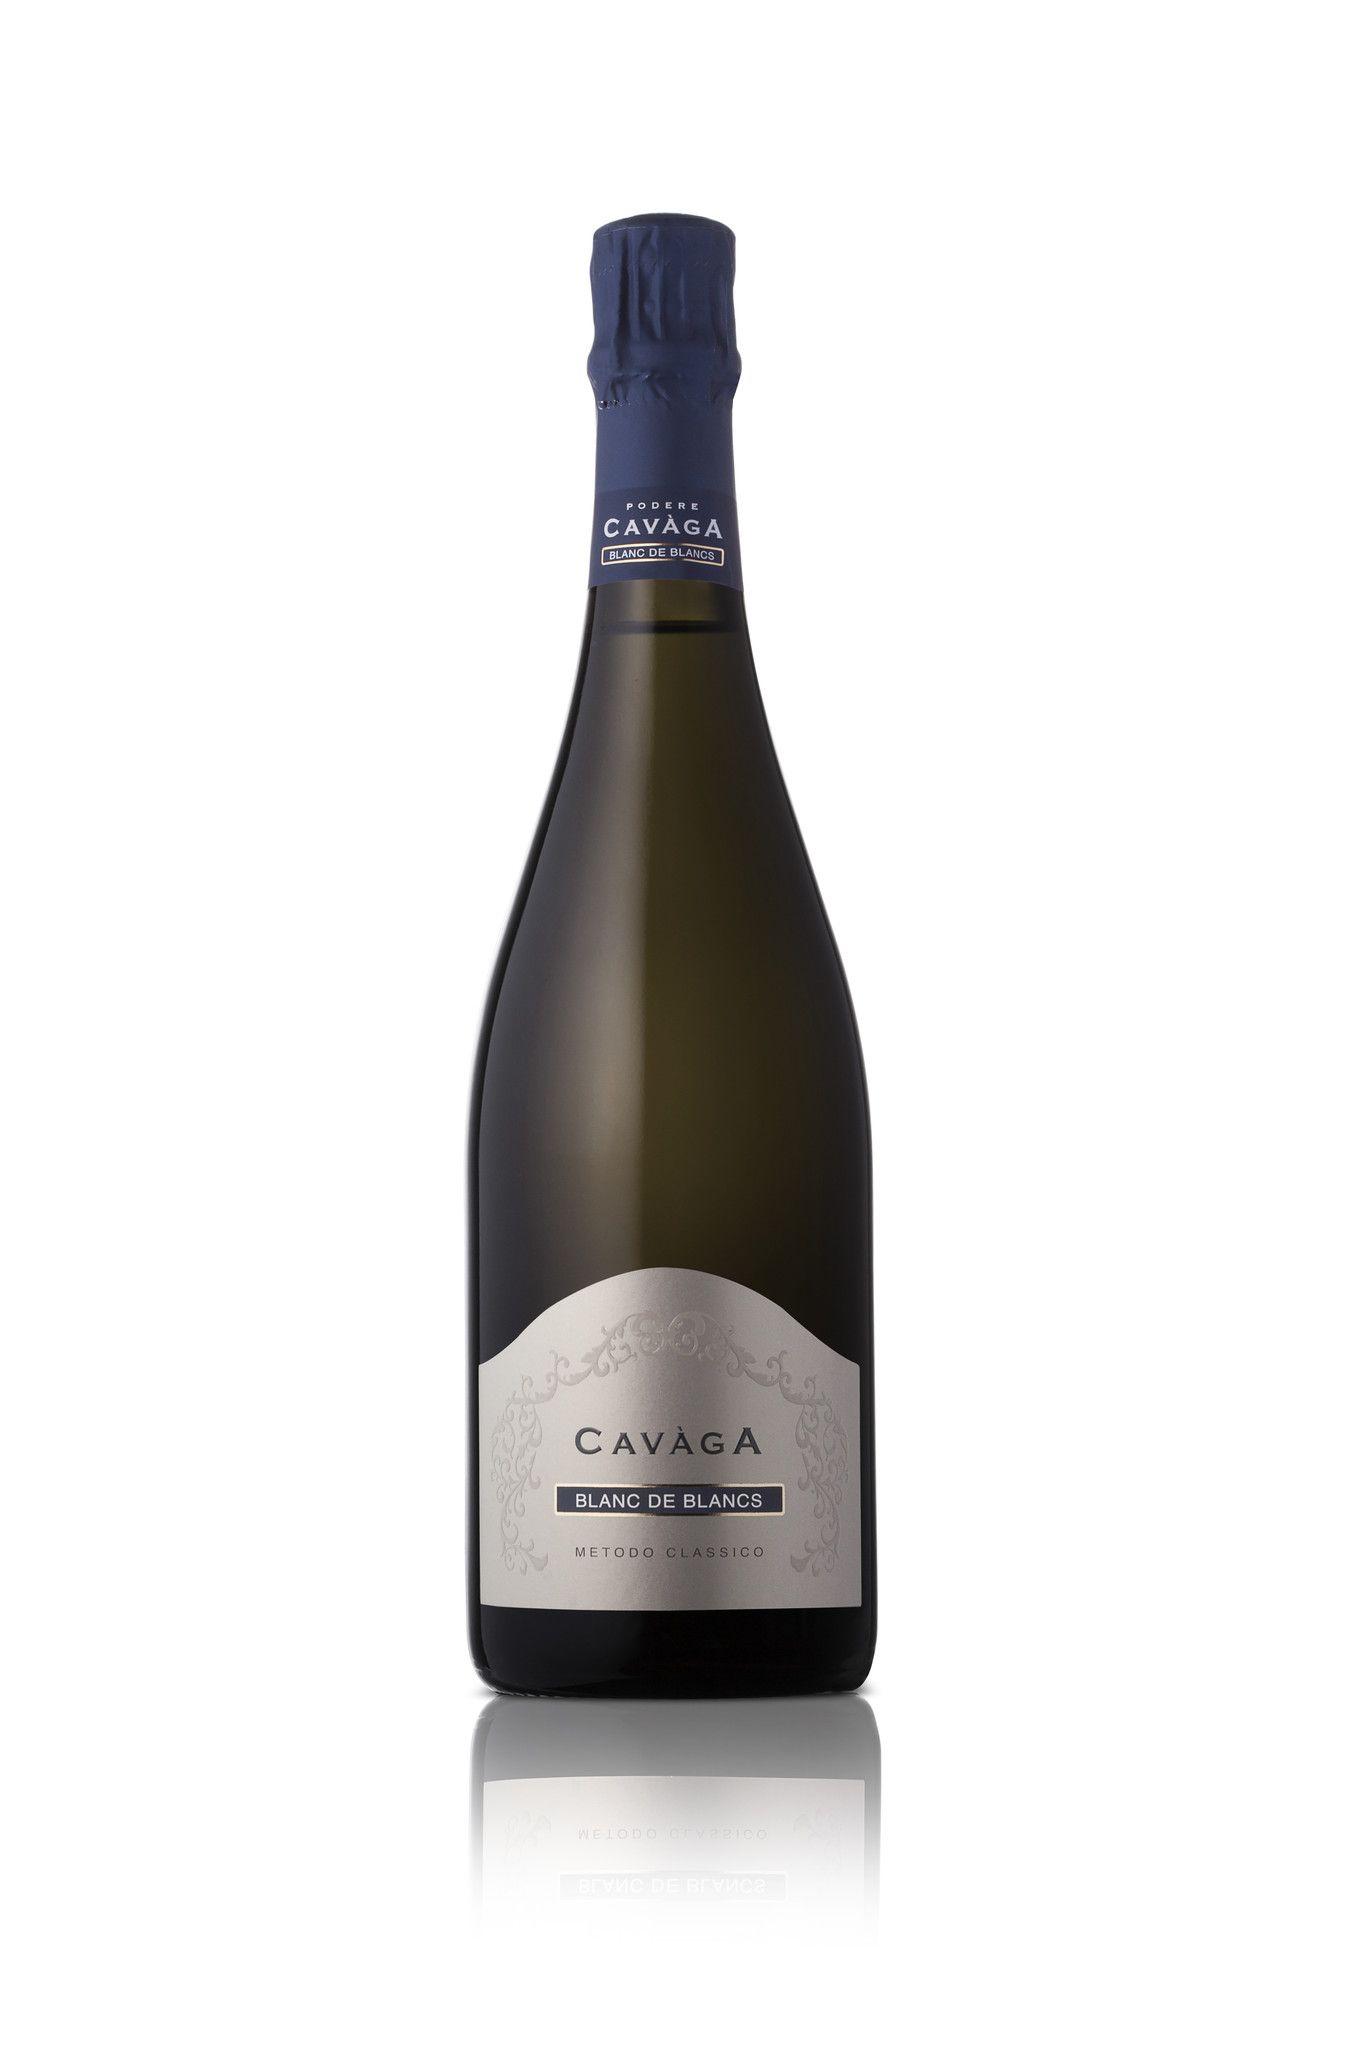 Spumante Bollicine Blanc de Blancs Metodo Classico Cavaga 2012 0,75 lt